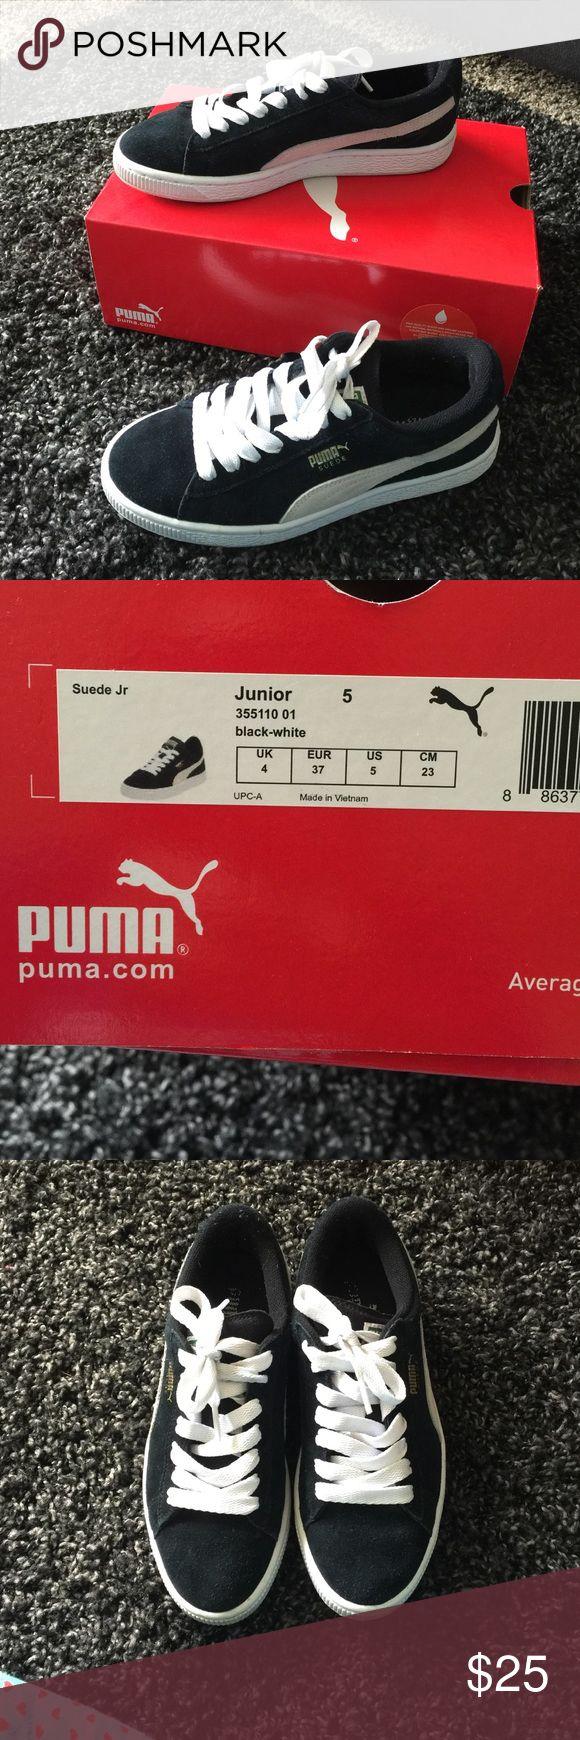 black puma suede size 6